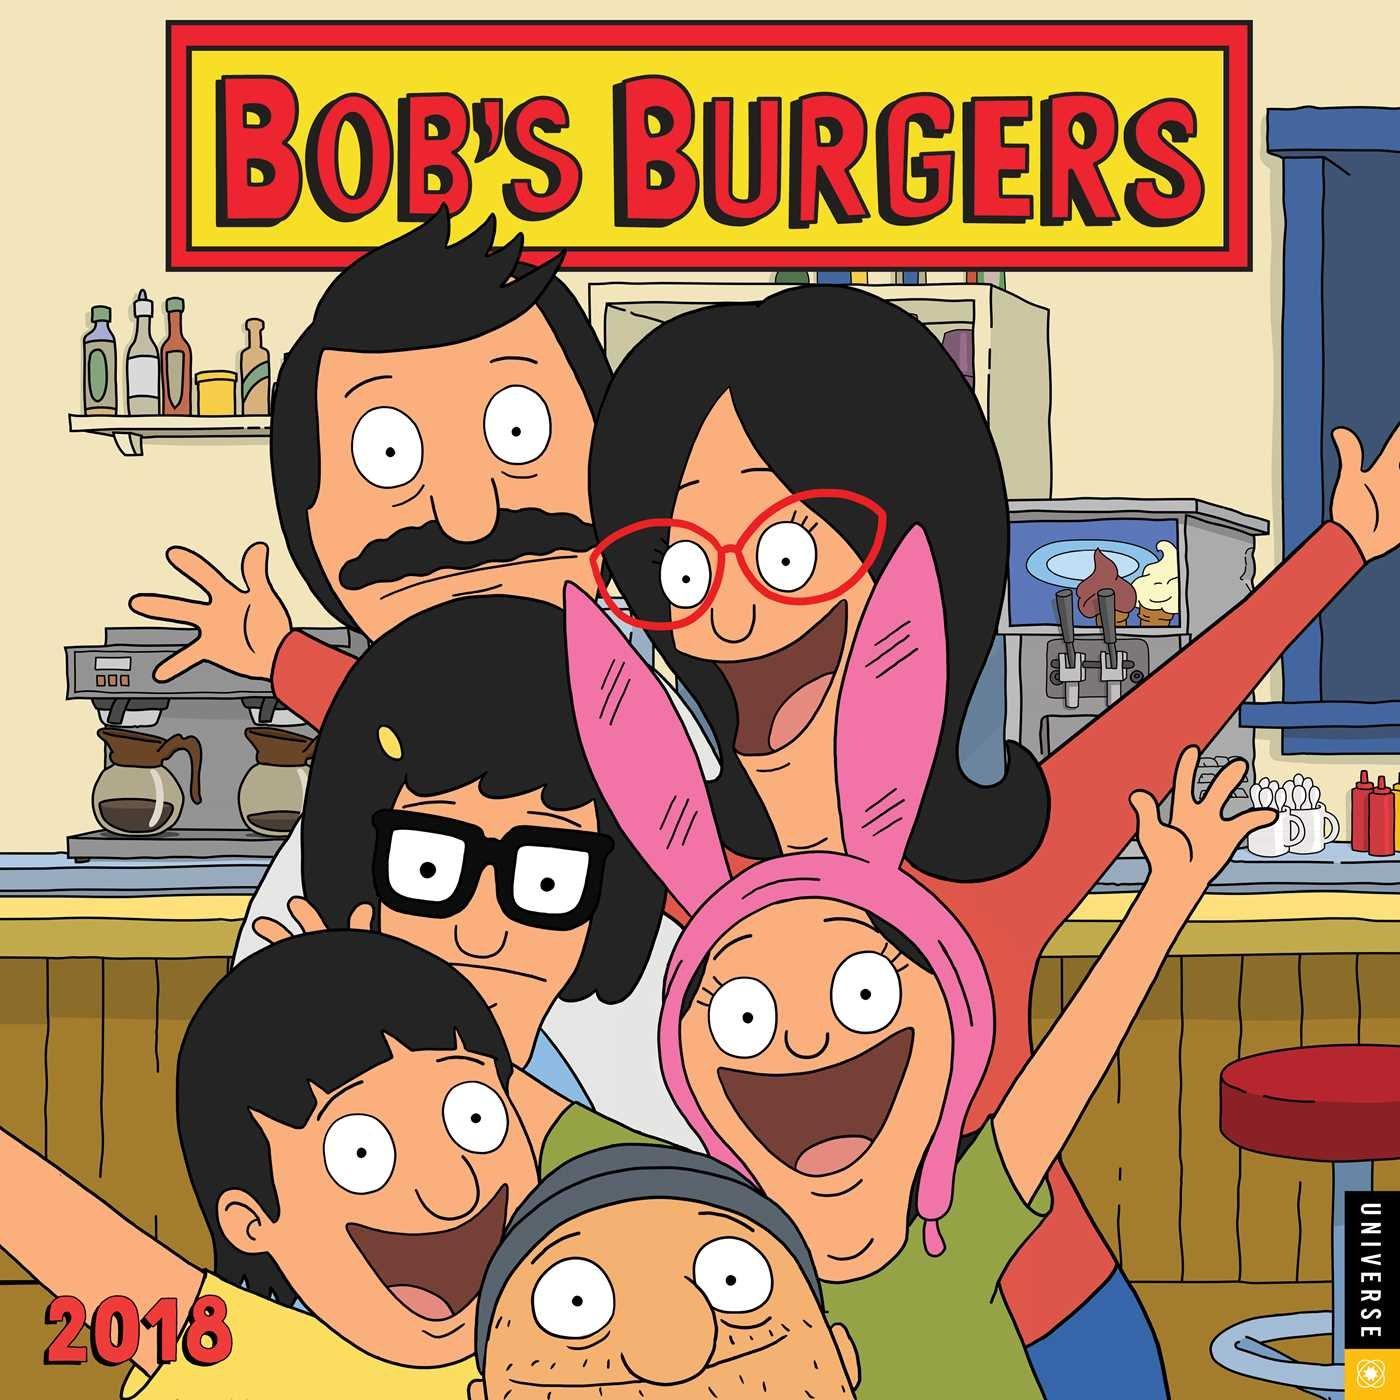 Bob's Burgers 2018 Wall Calendar by Universe Publishing